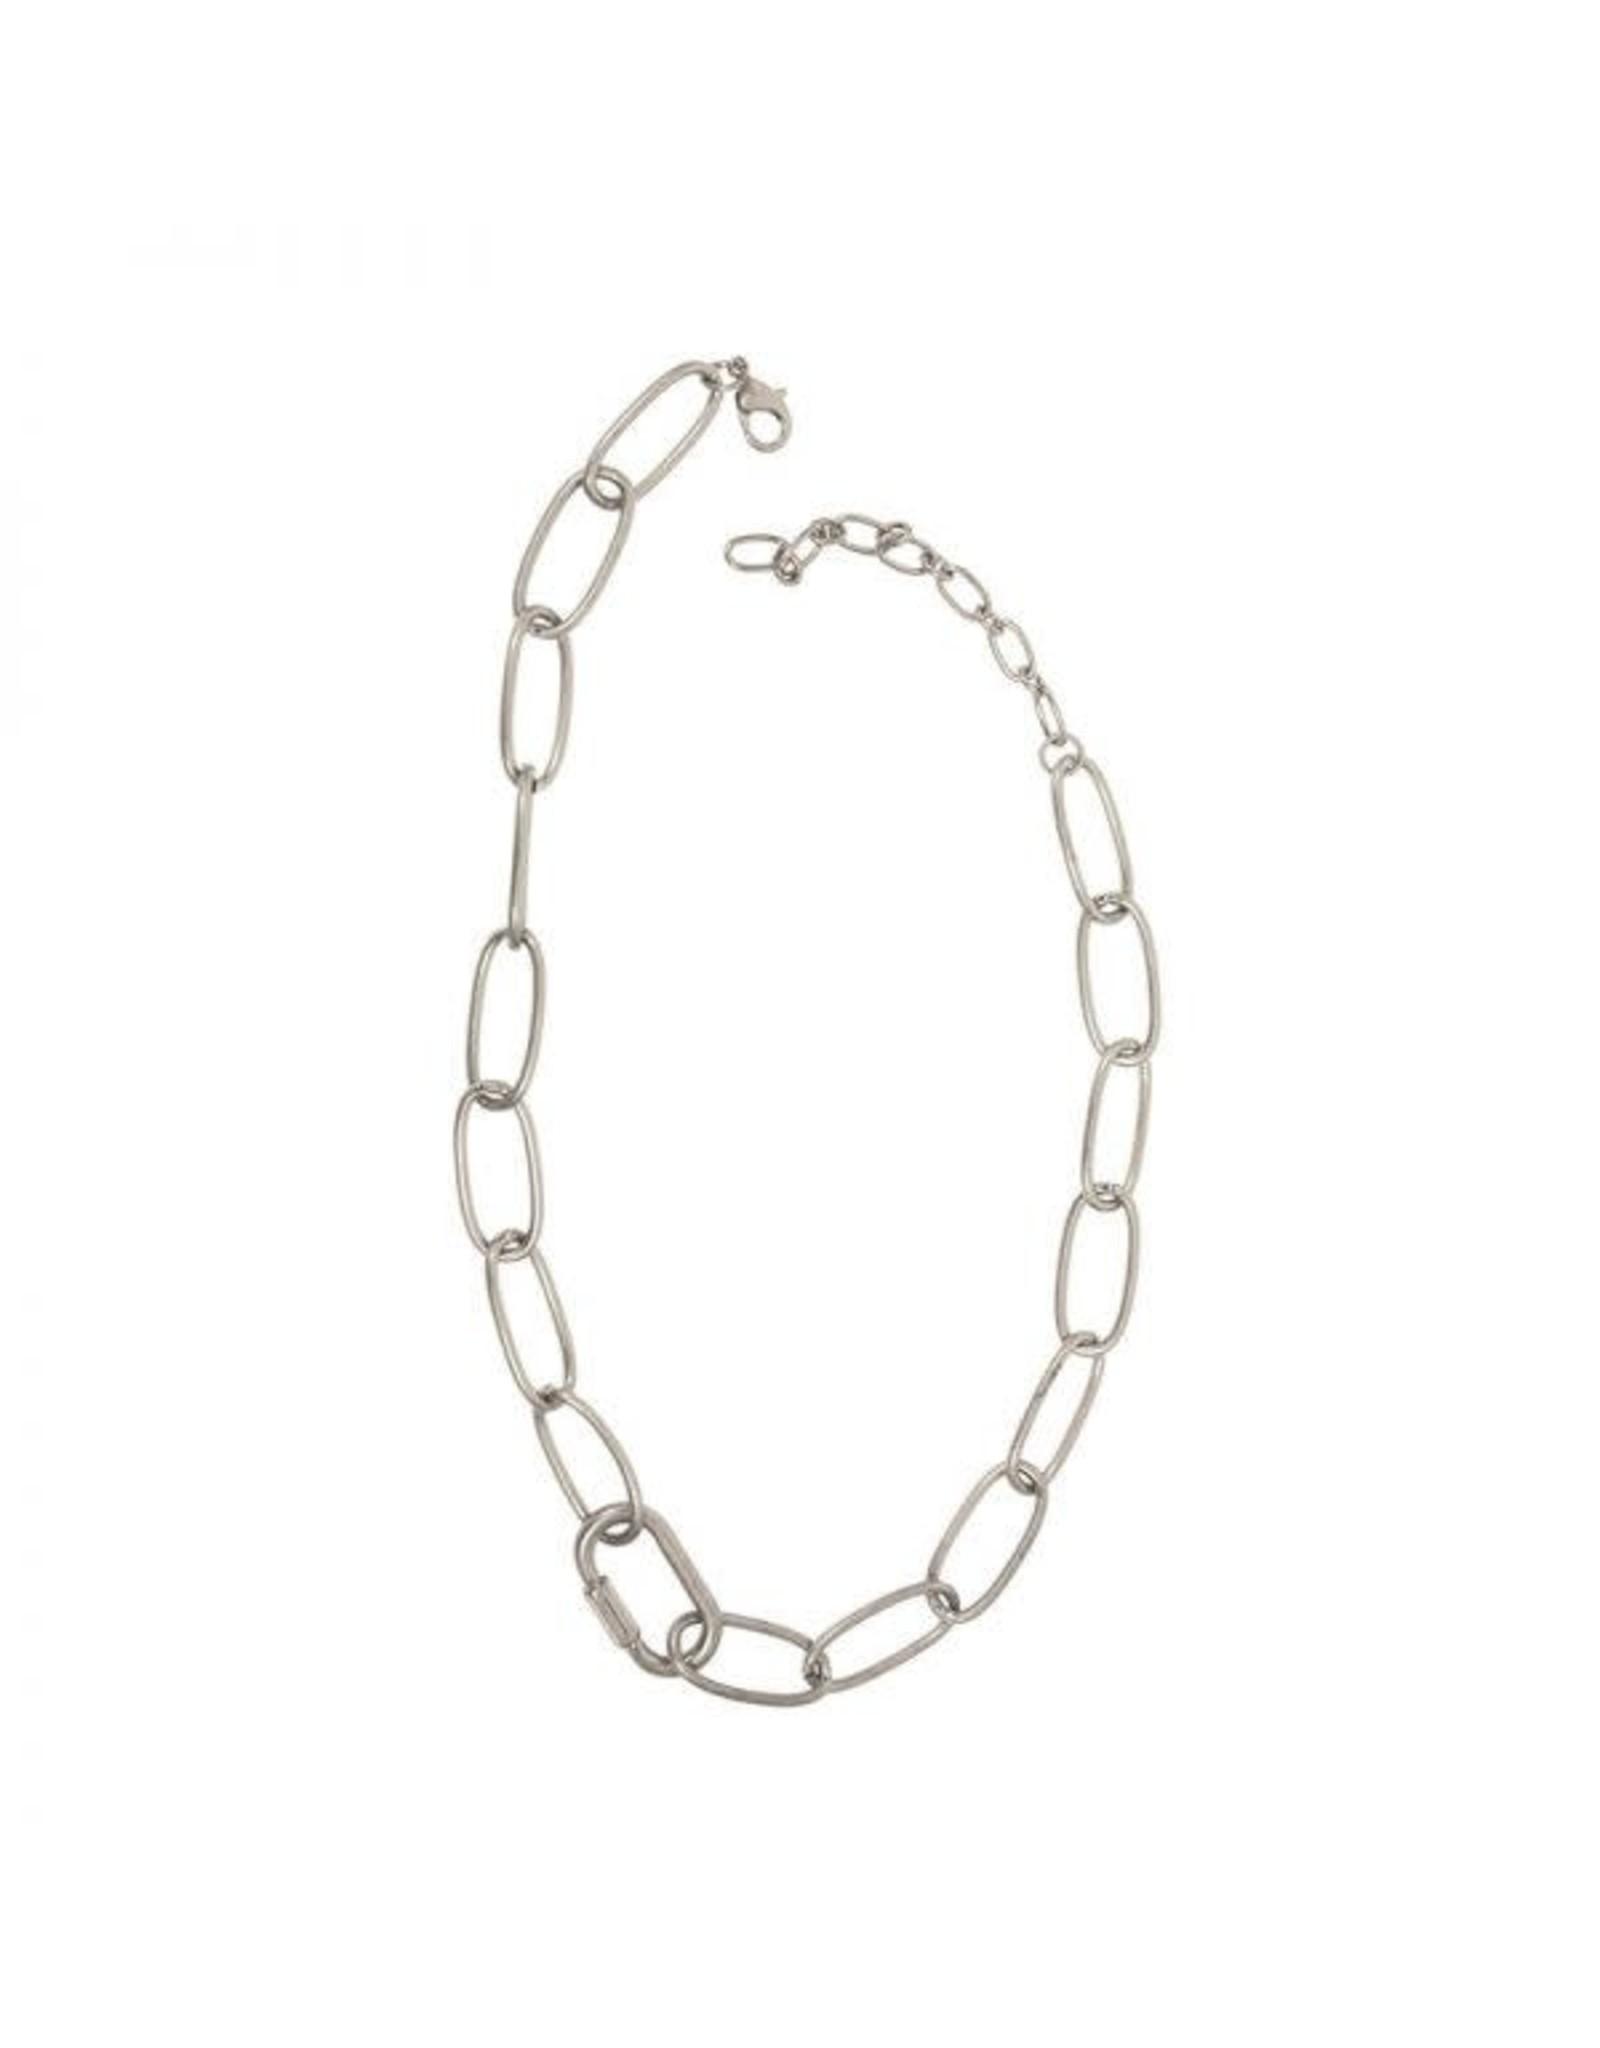 Joy Susan Silver Oval Link Chain Necklace